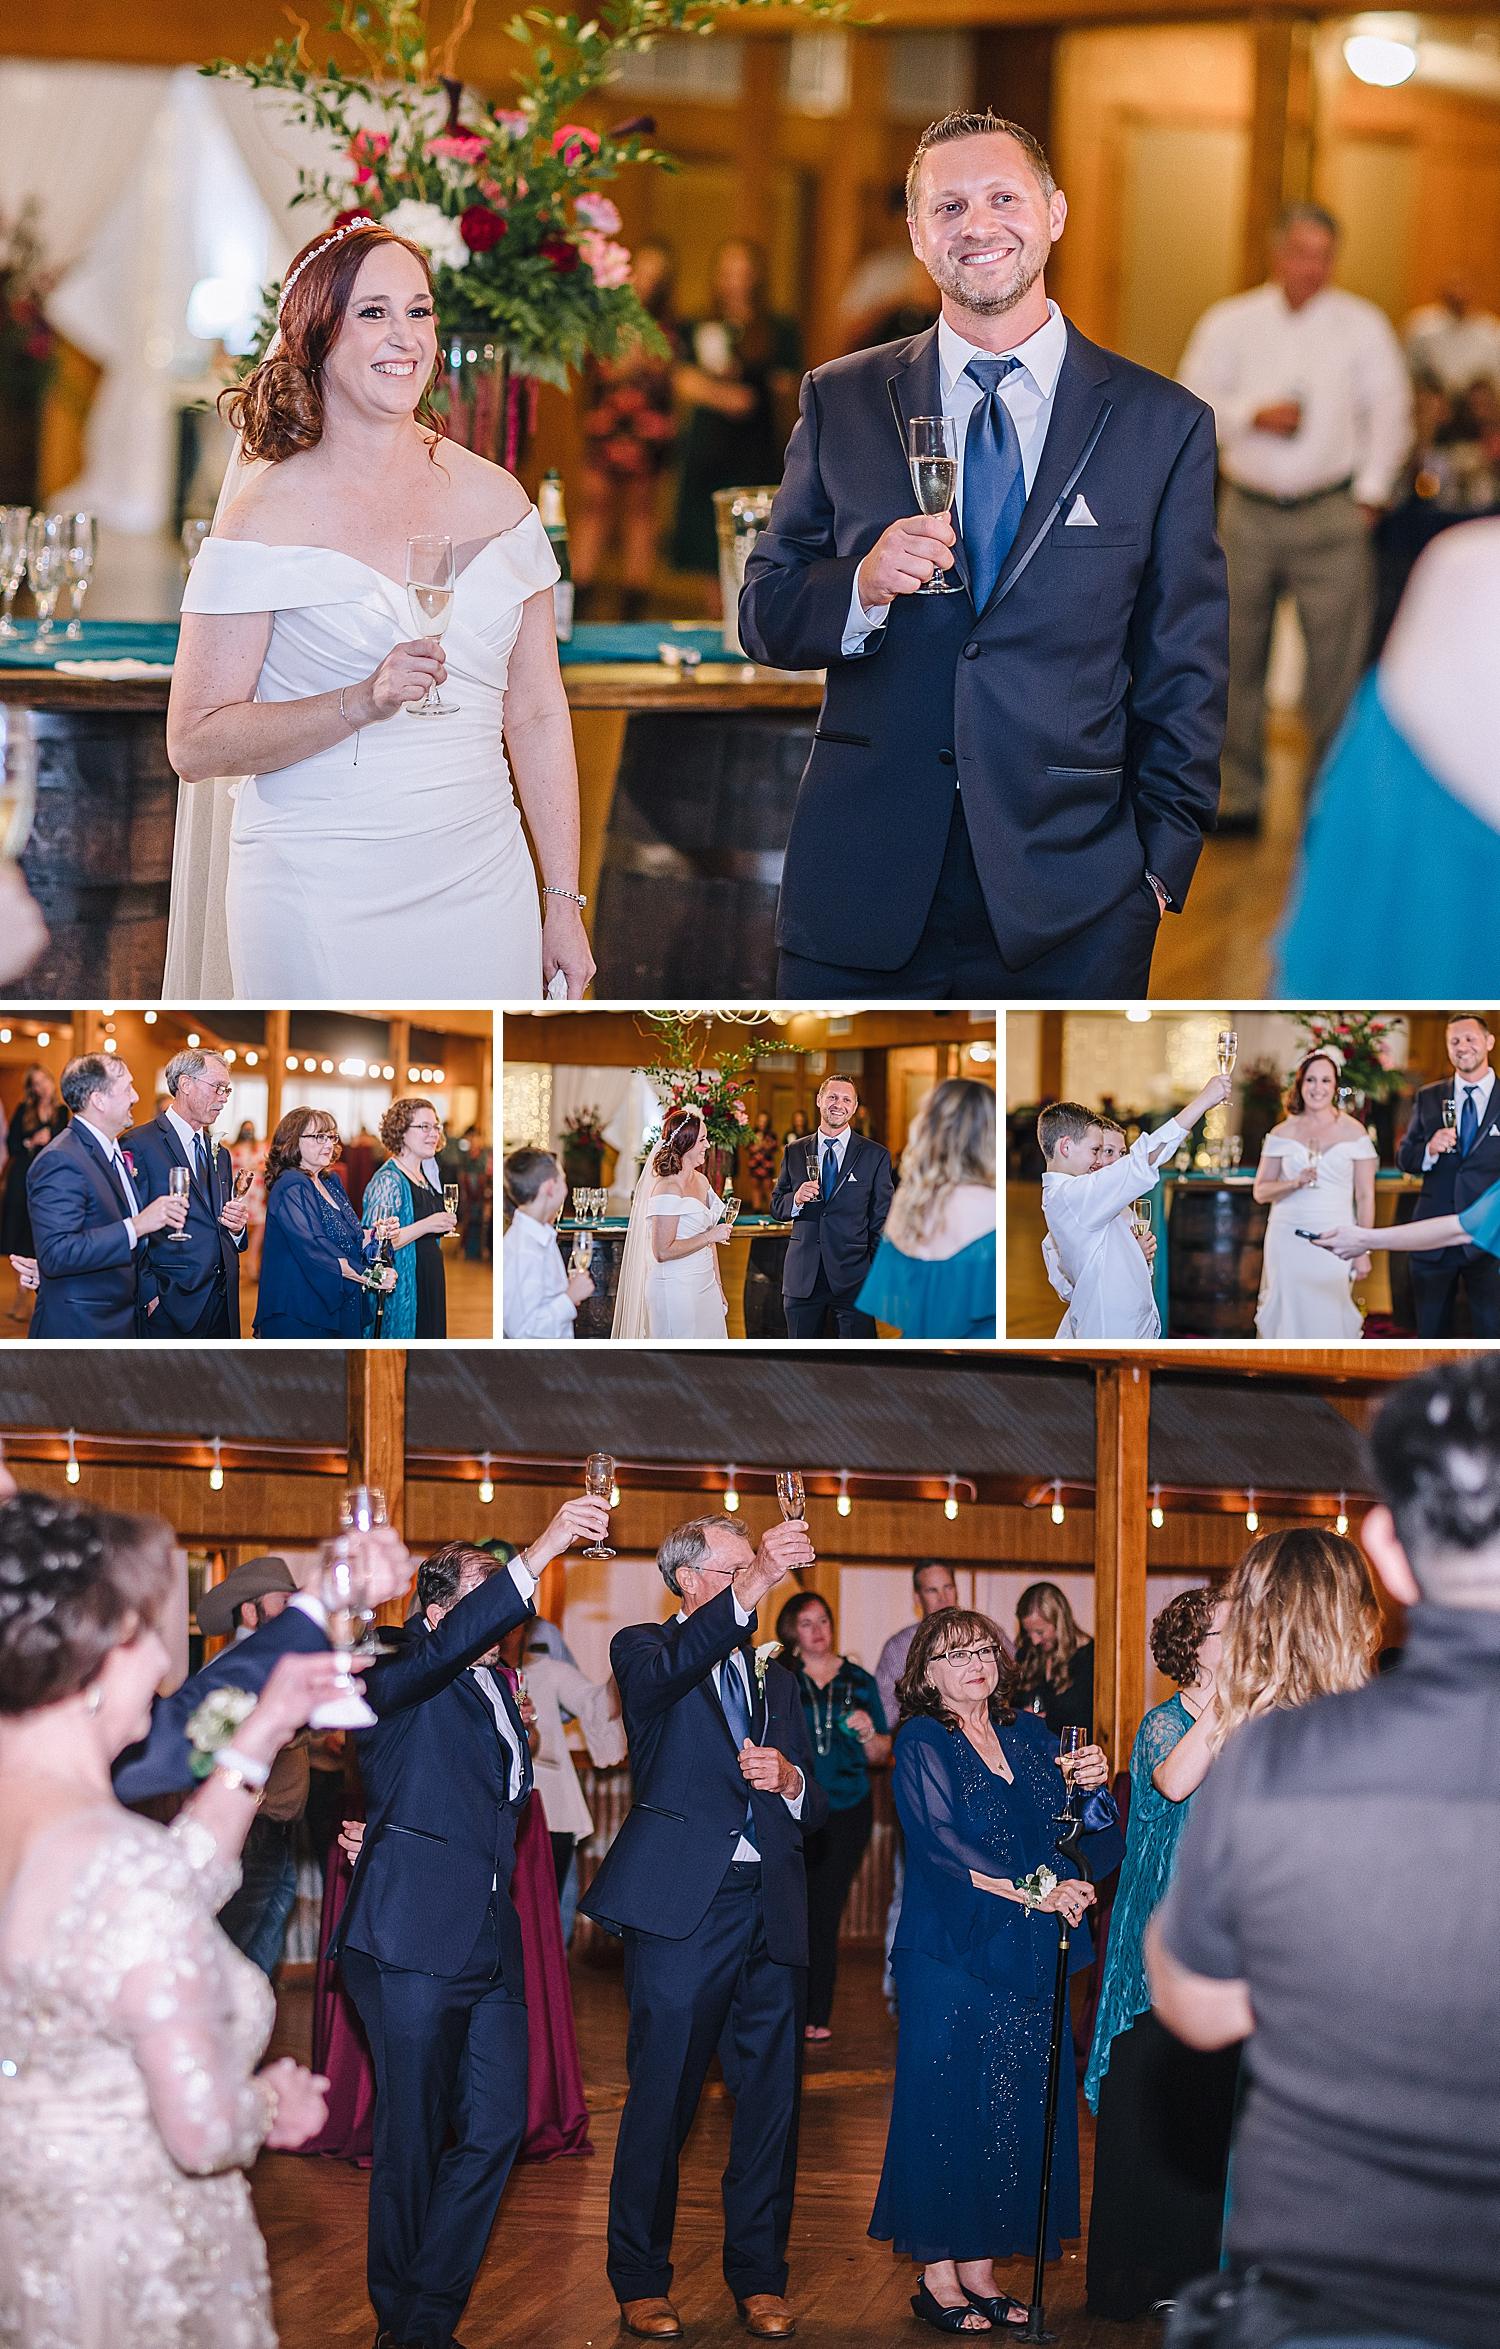 Jewel-Tone-Texas-Wedding-Valerie-Jason-Carly-Barton-Photography_0087.jpg